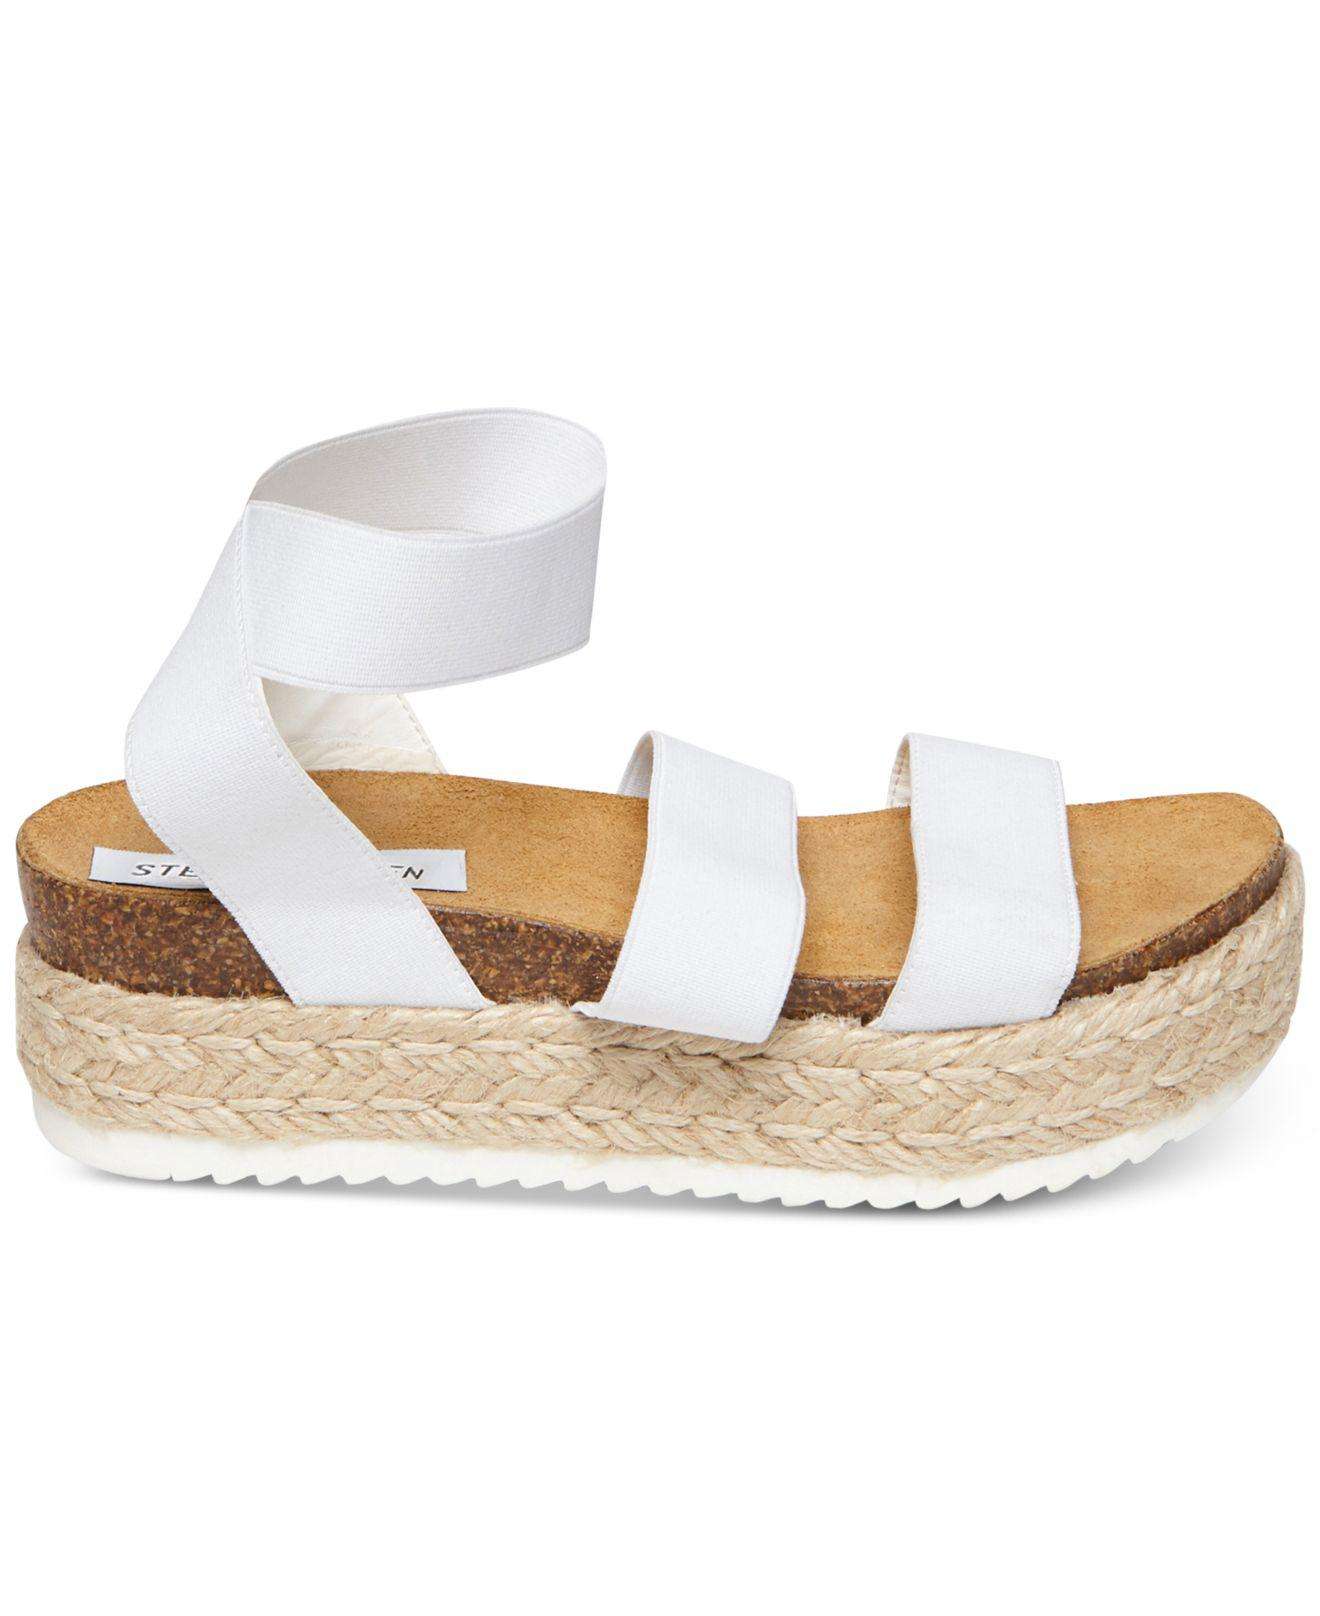 5d943e4572d Women's White Kimmie Flatform Espadrille Sandals